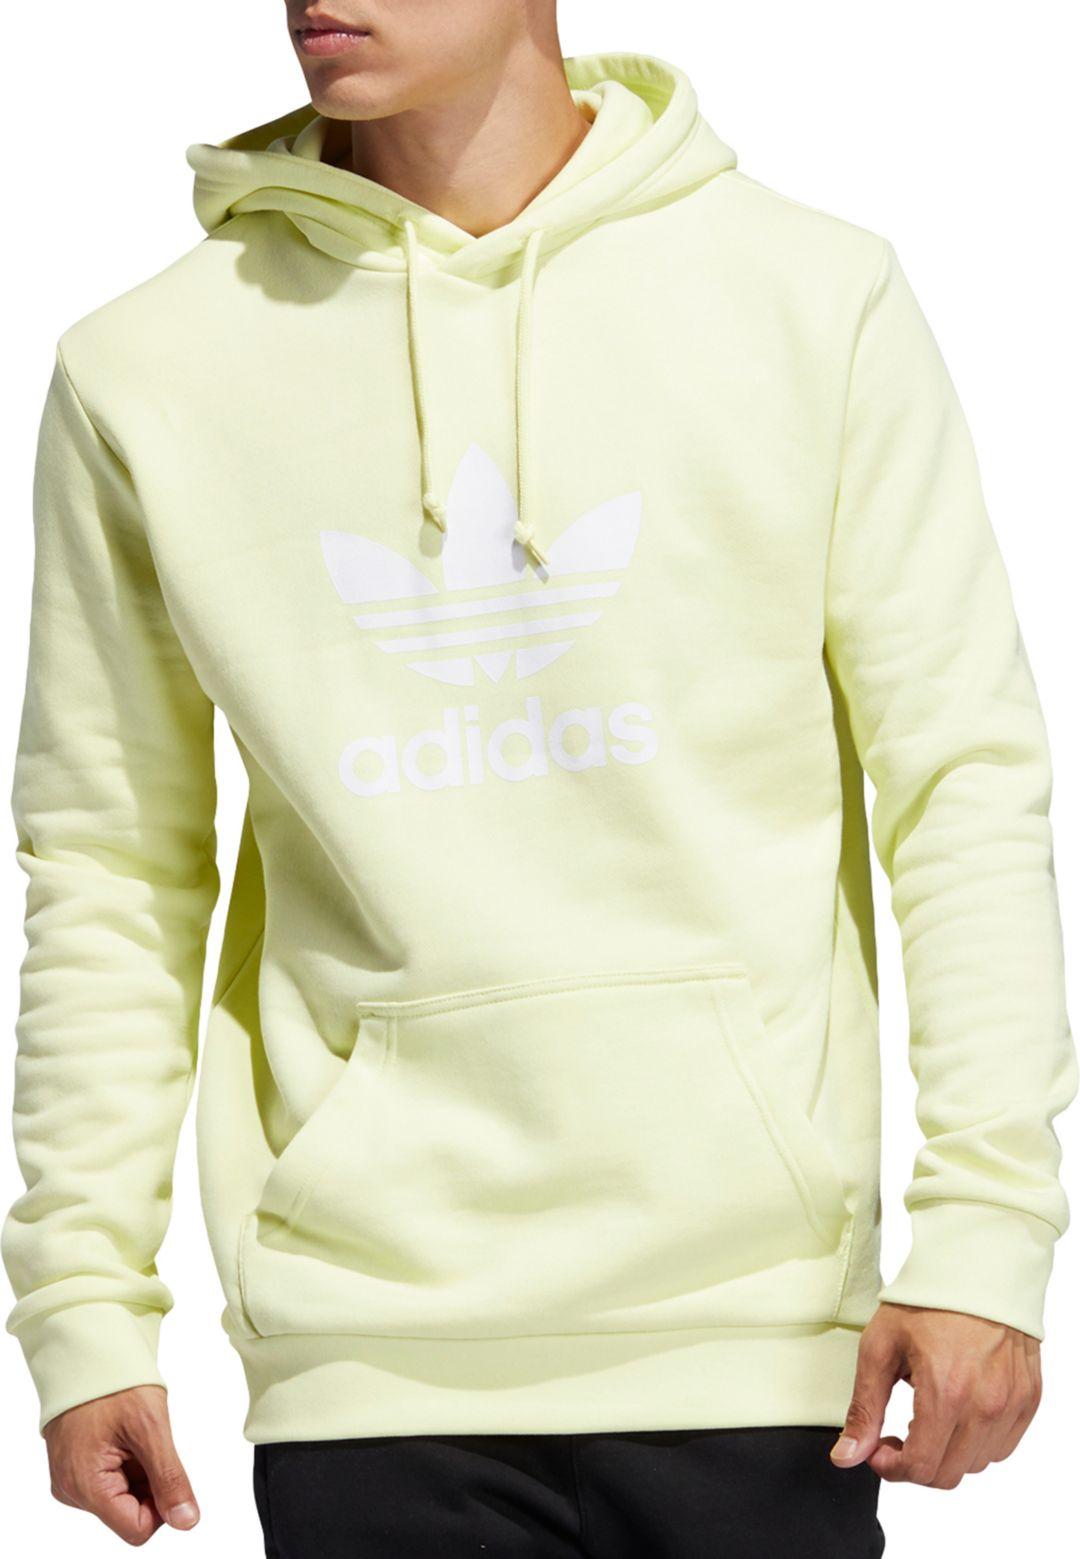 adidas Originals Hoodies | Men's | size?